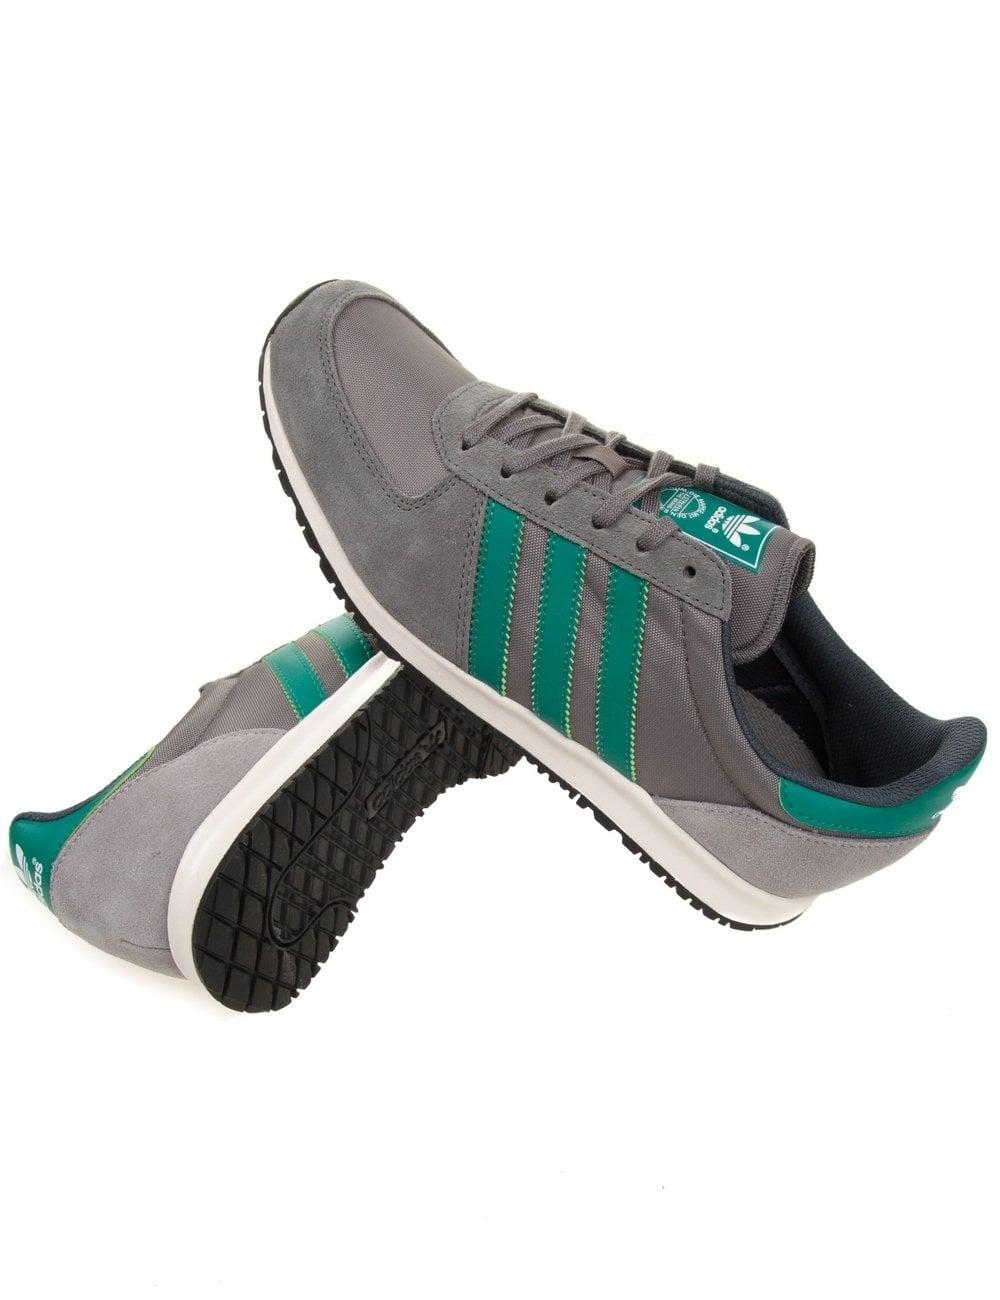 35deec654f3 Adidas Originals Adistar Racer Shoes - Ash Subgreen - Footwear from ...